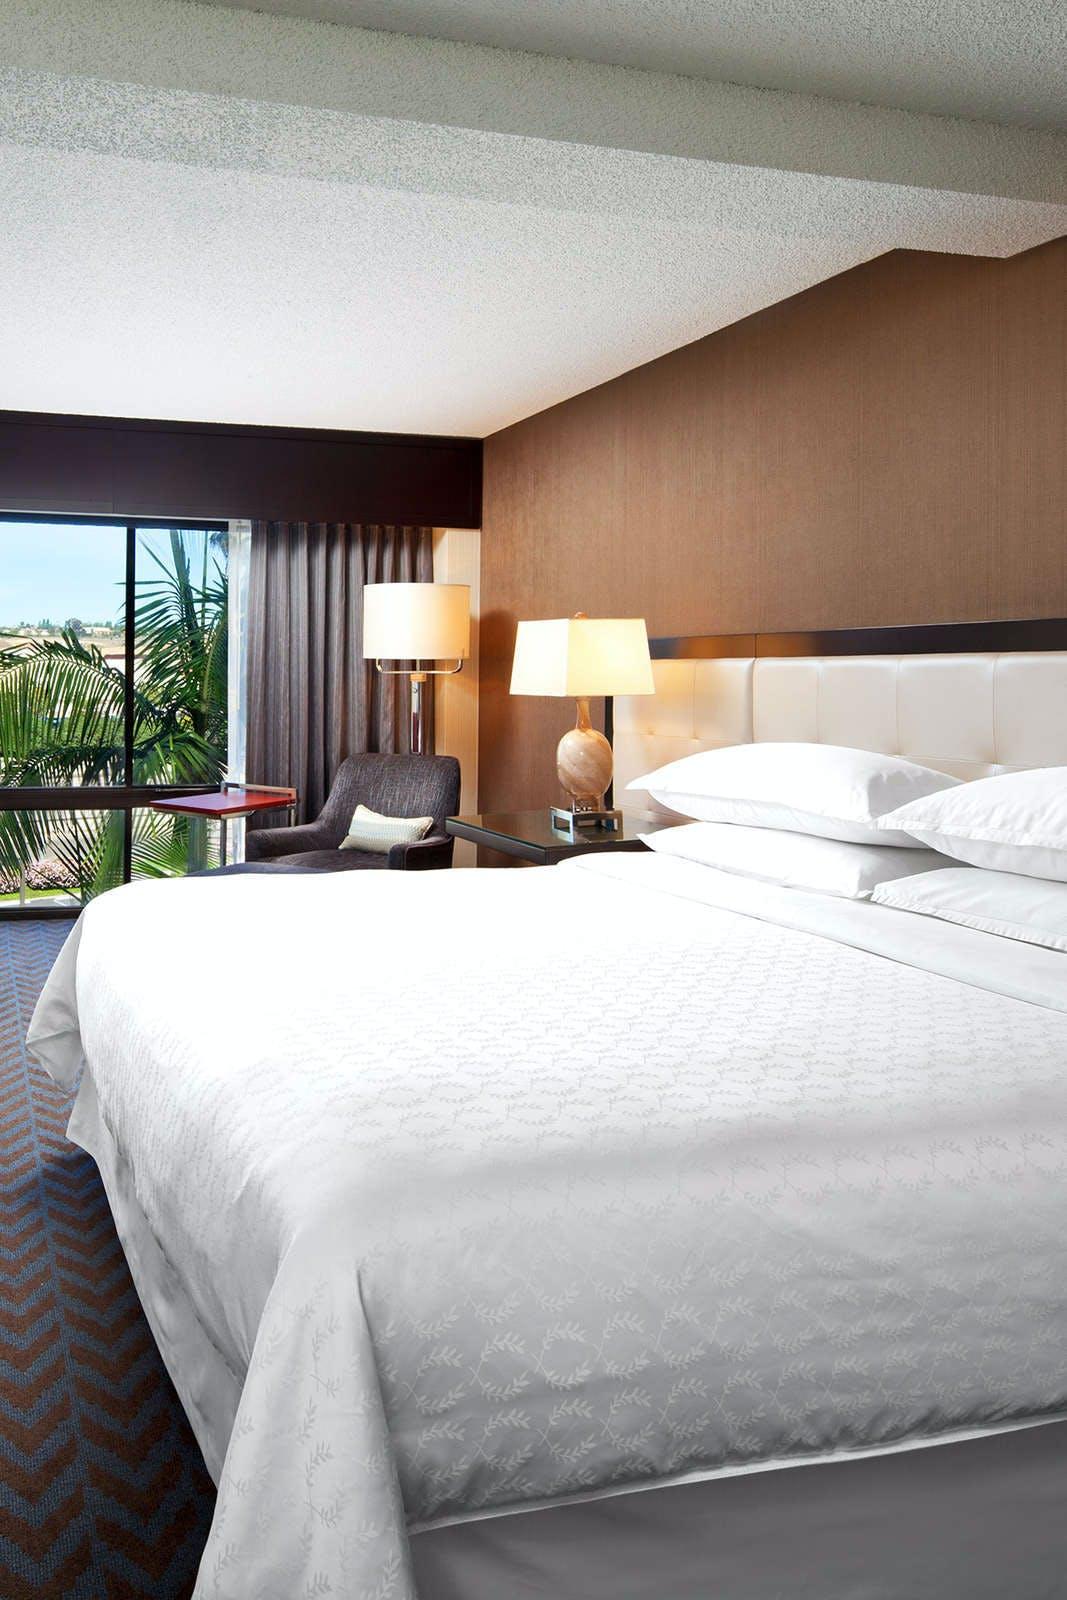 Sheraton Mission Valley San Diego Hotel